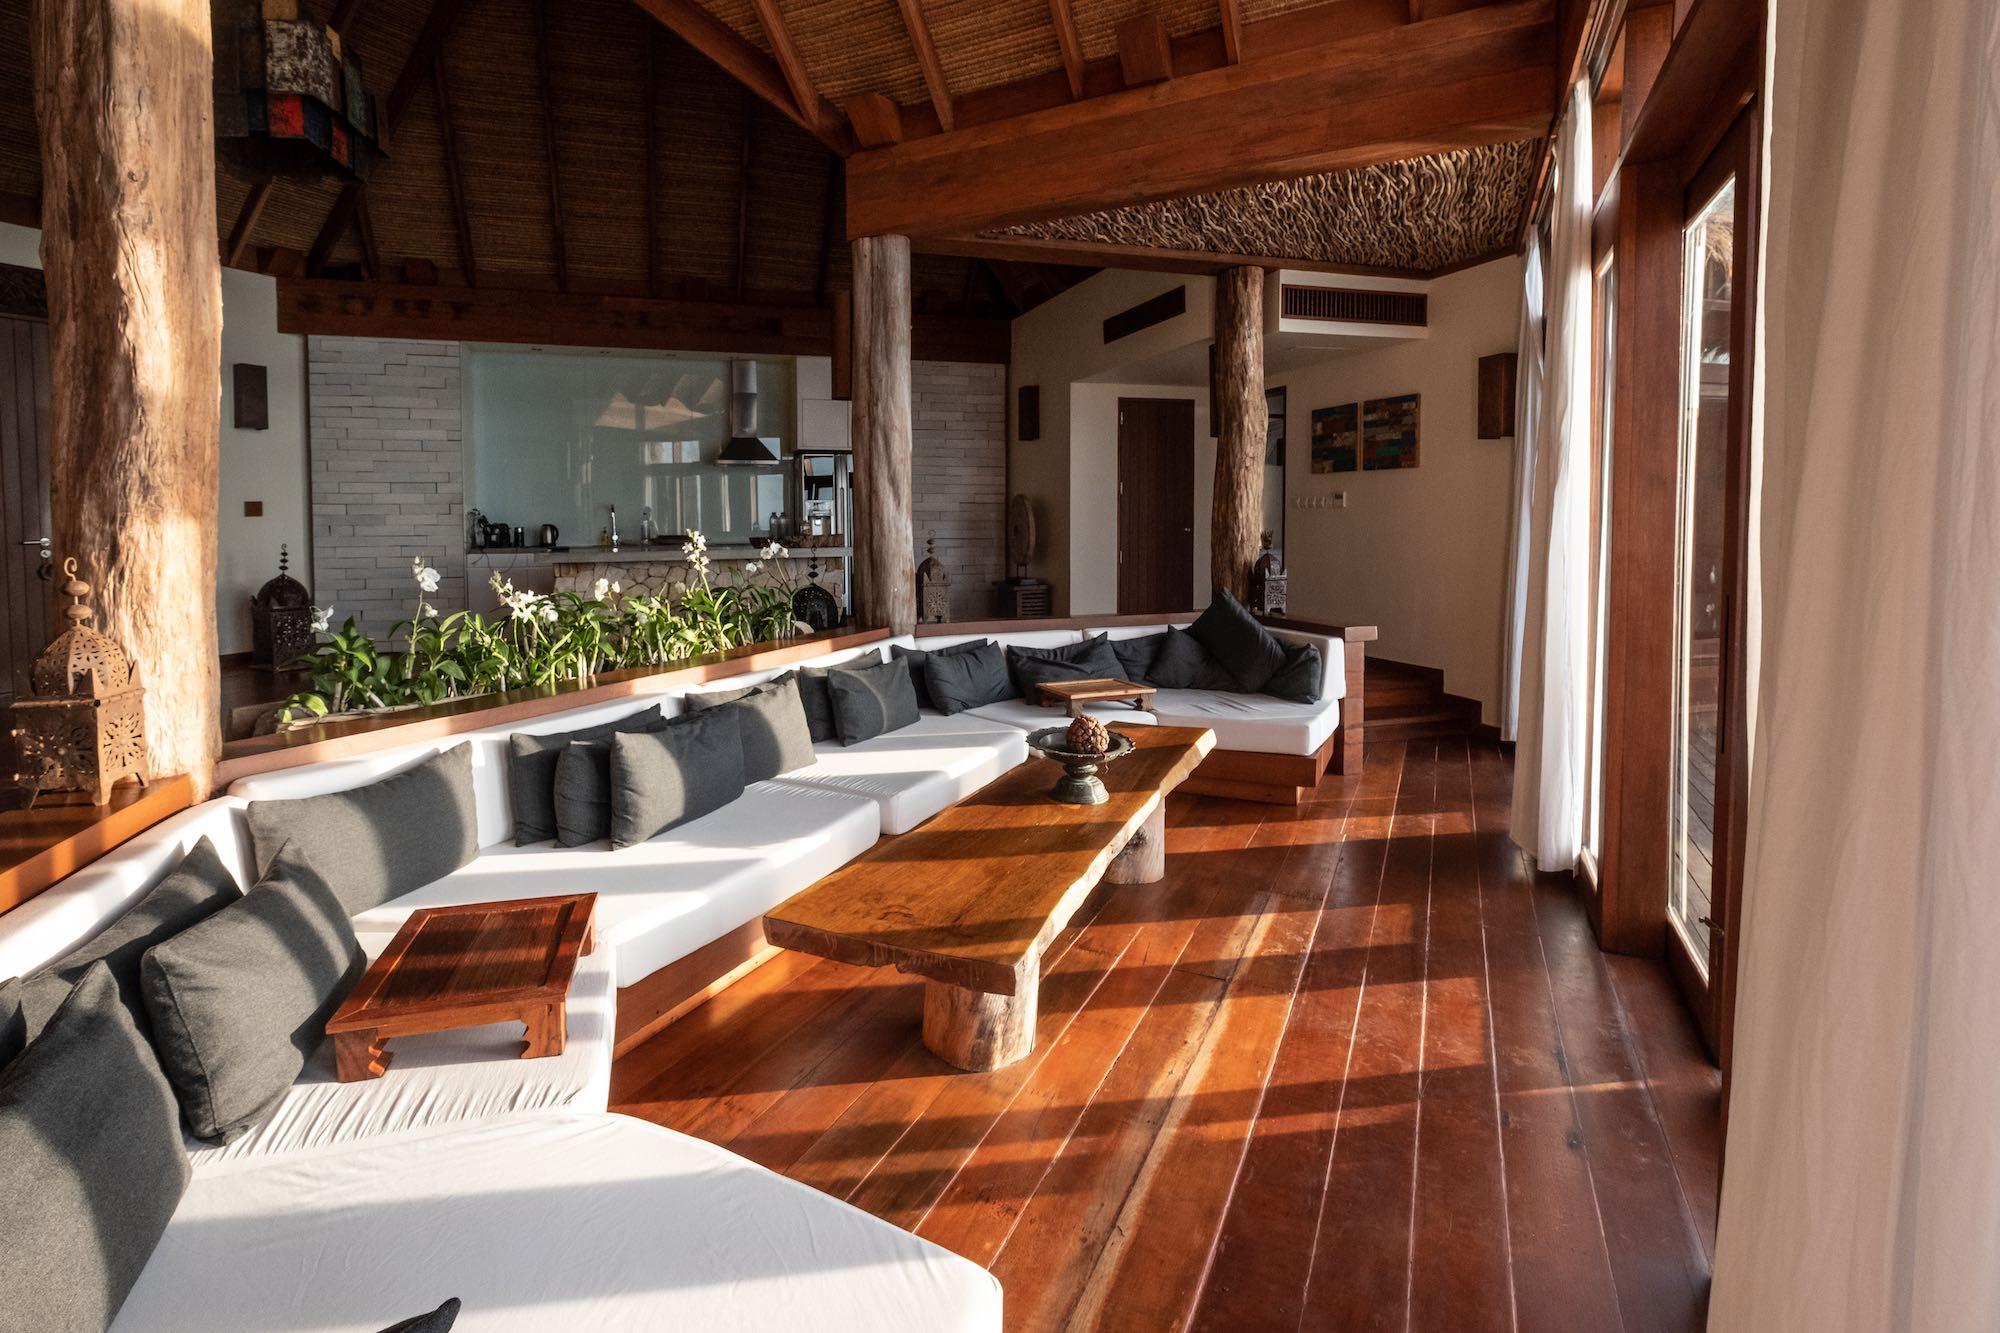 Hospitality Photography Cambodia Asia Interiors Hotel Singapore Coco Creative Studio 15